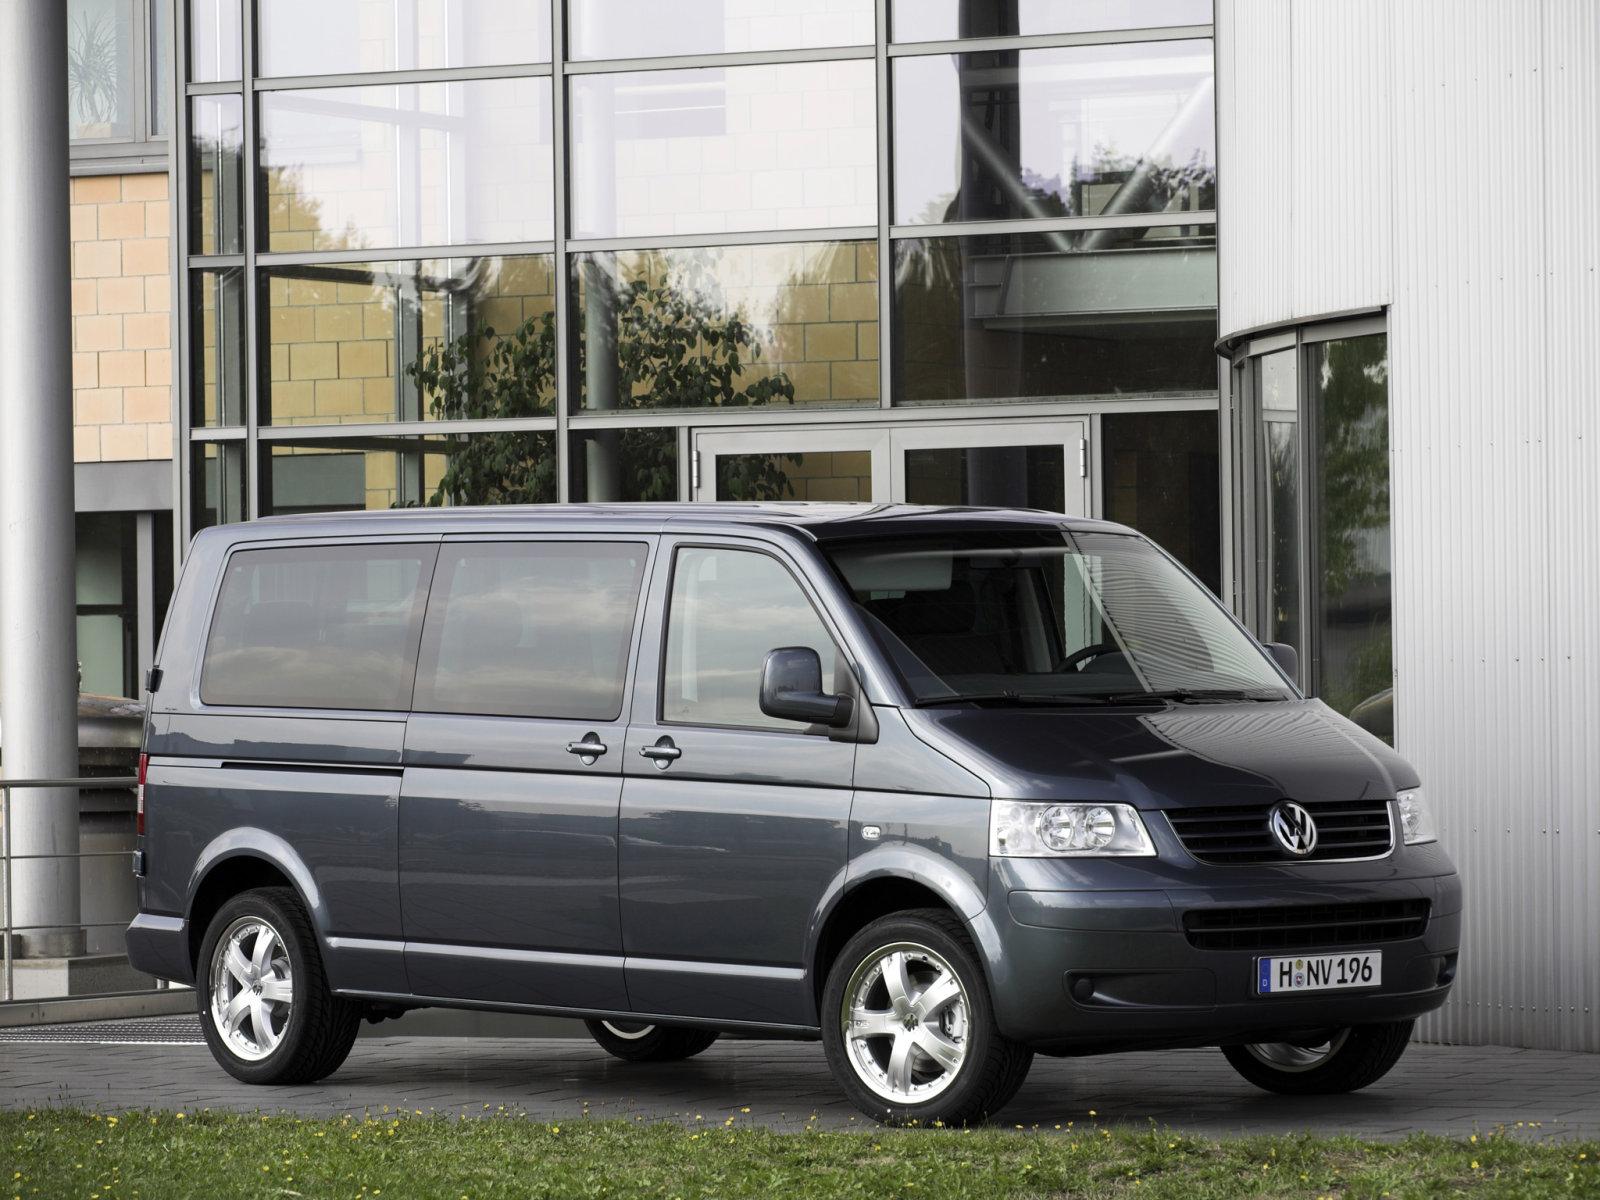 Volkswagen (Фольксваген) Multivan 2003-2010 г.